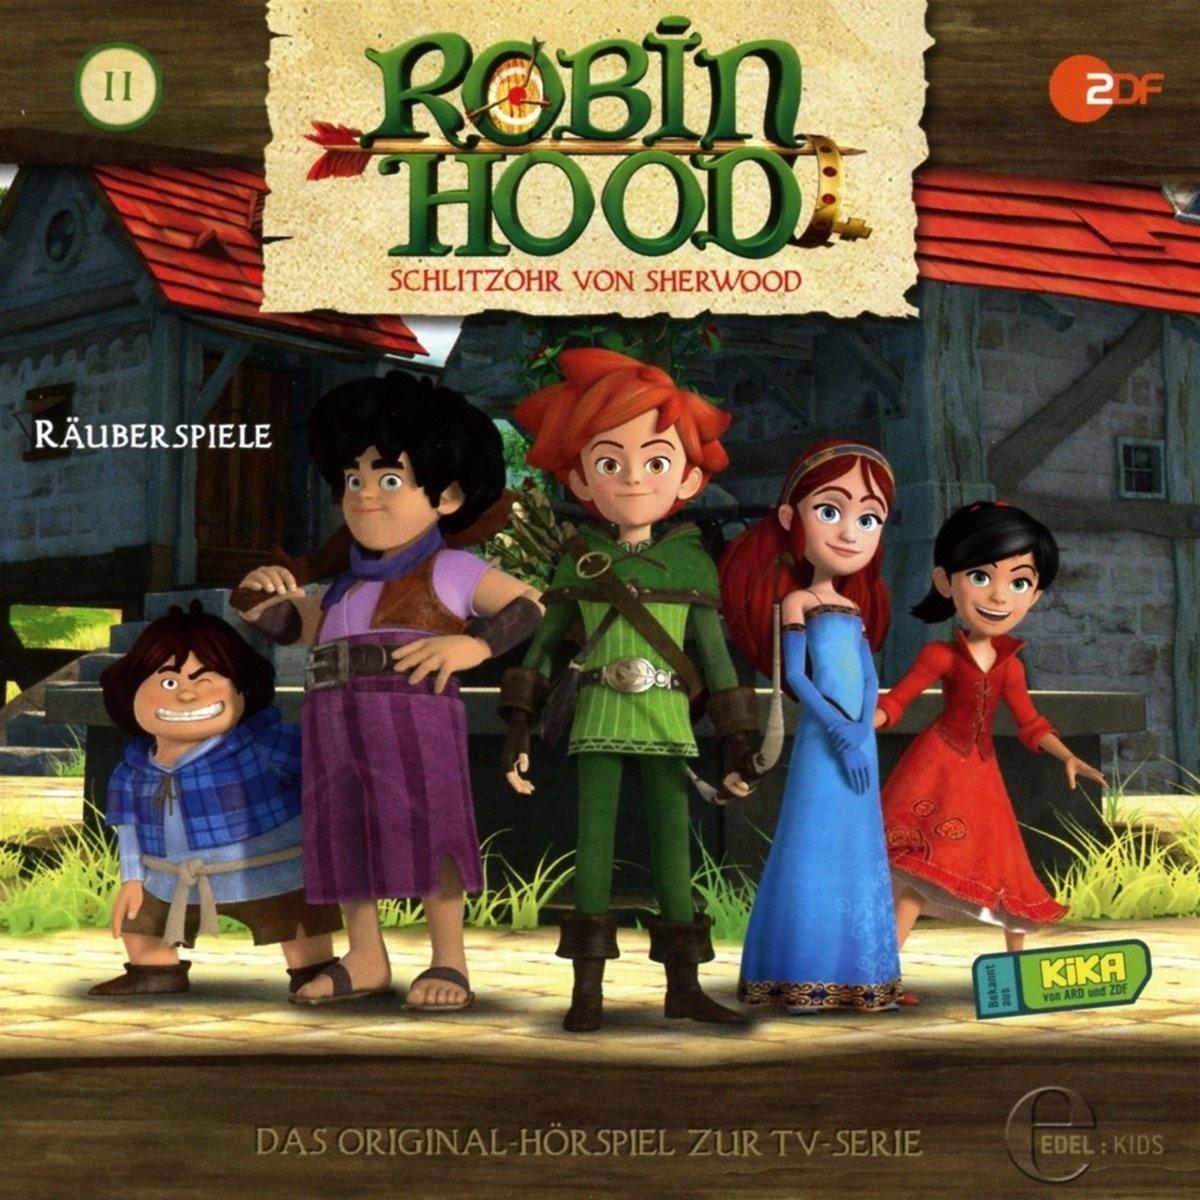 Robin Hood Kika Youtube Genial Music Site Robin Hood Schlitzohr Von Sherwood Folge 11 Fotos